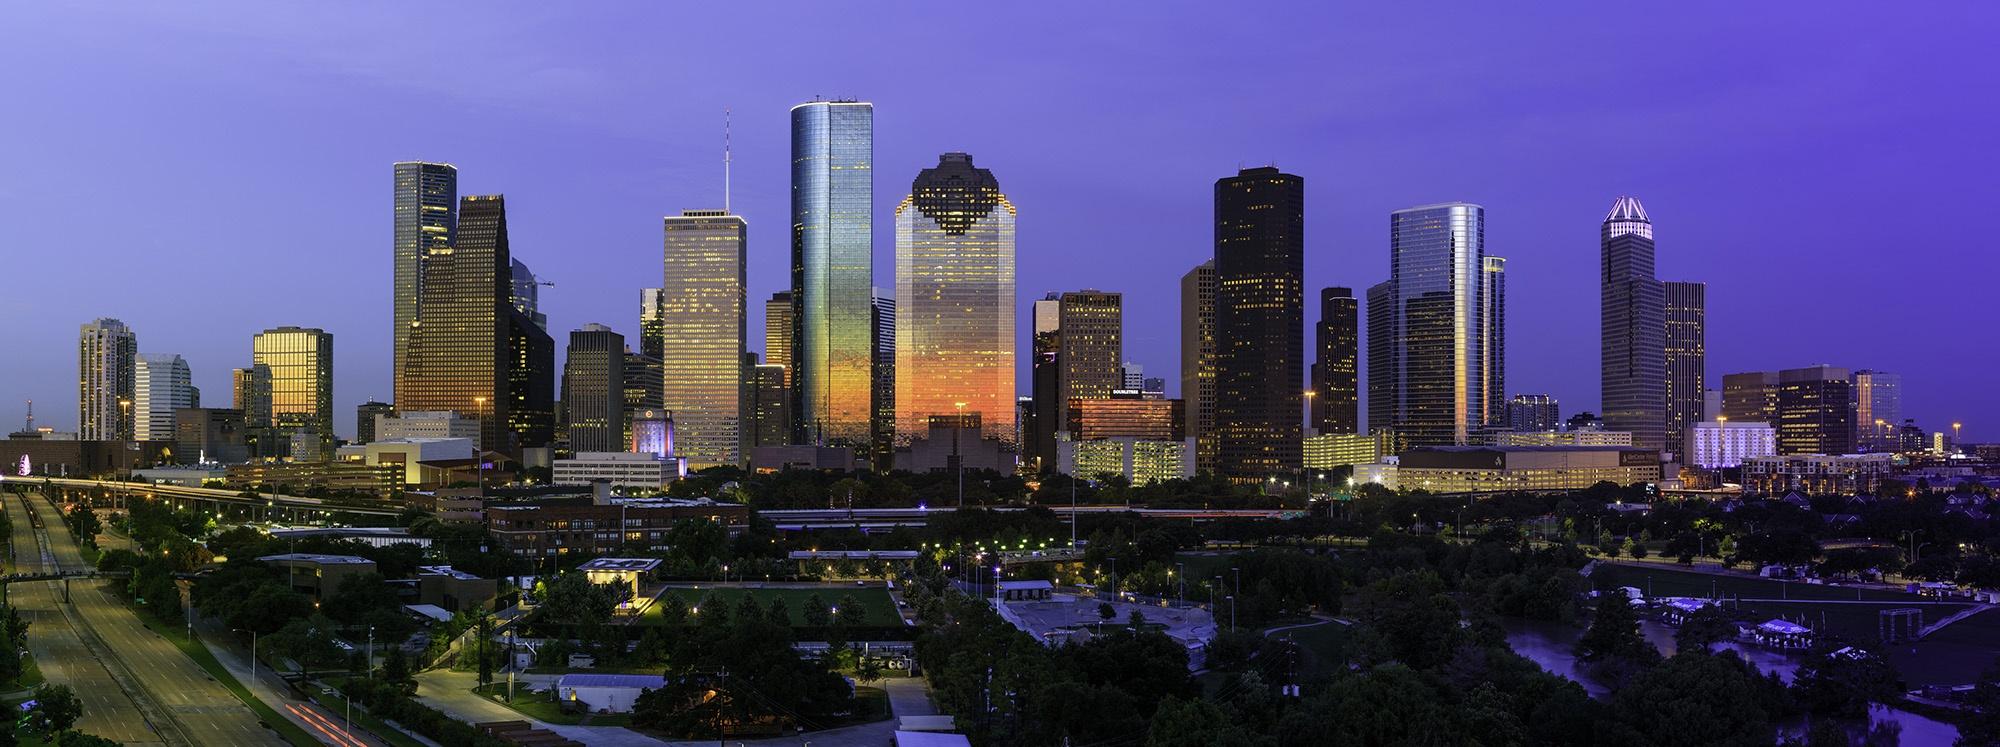 City of Houston Skyline July 4th 2018 with dramatic sunsetv